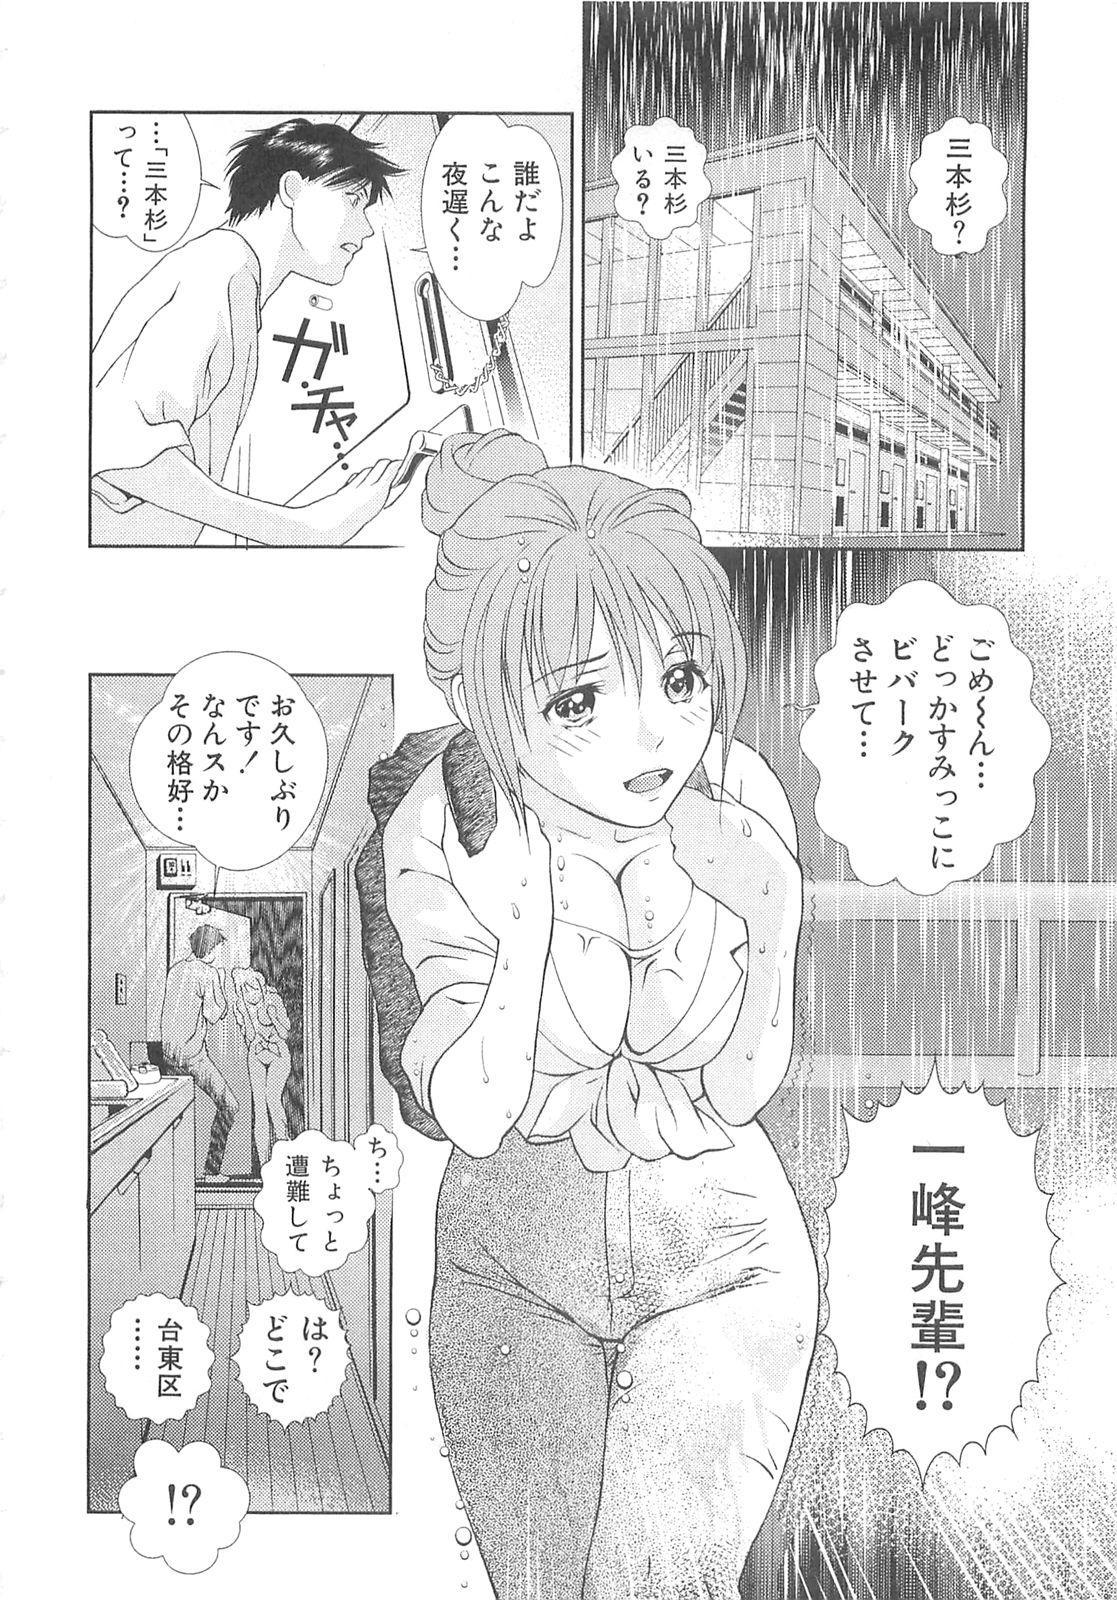 Tenshi no Kyuu - Angel's Pretty Hip 192